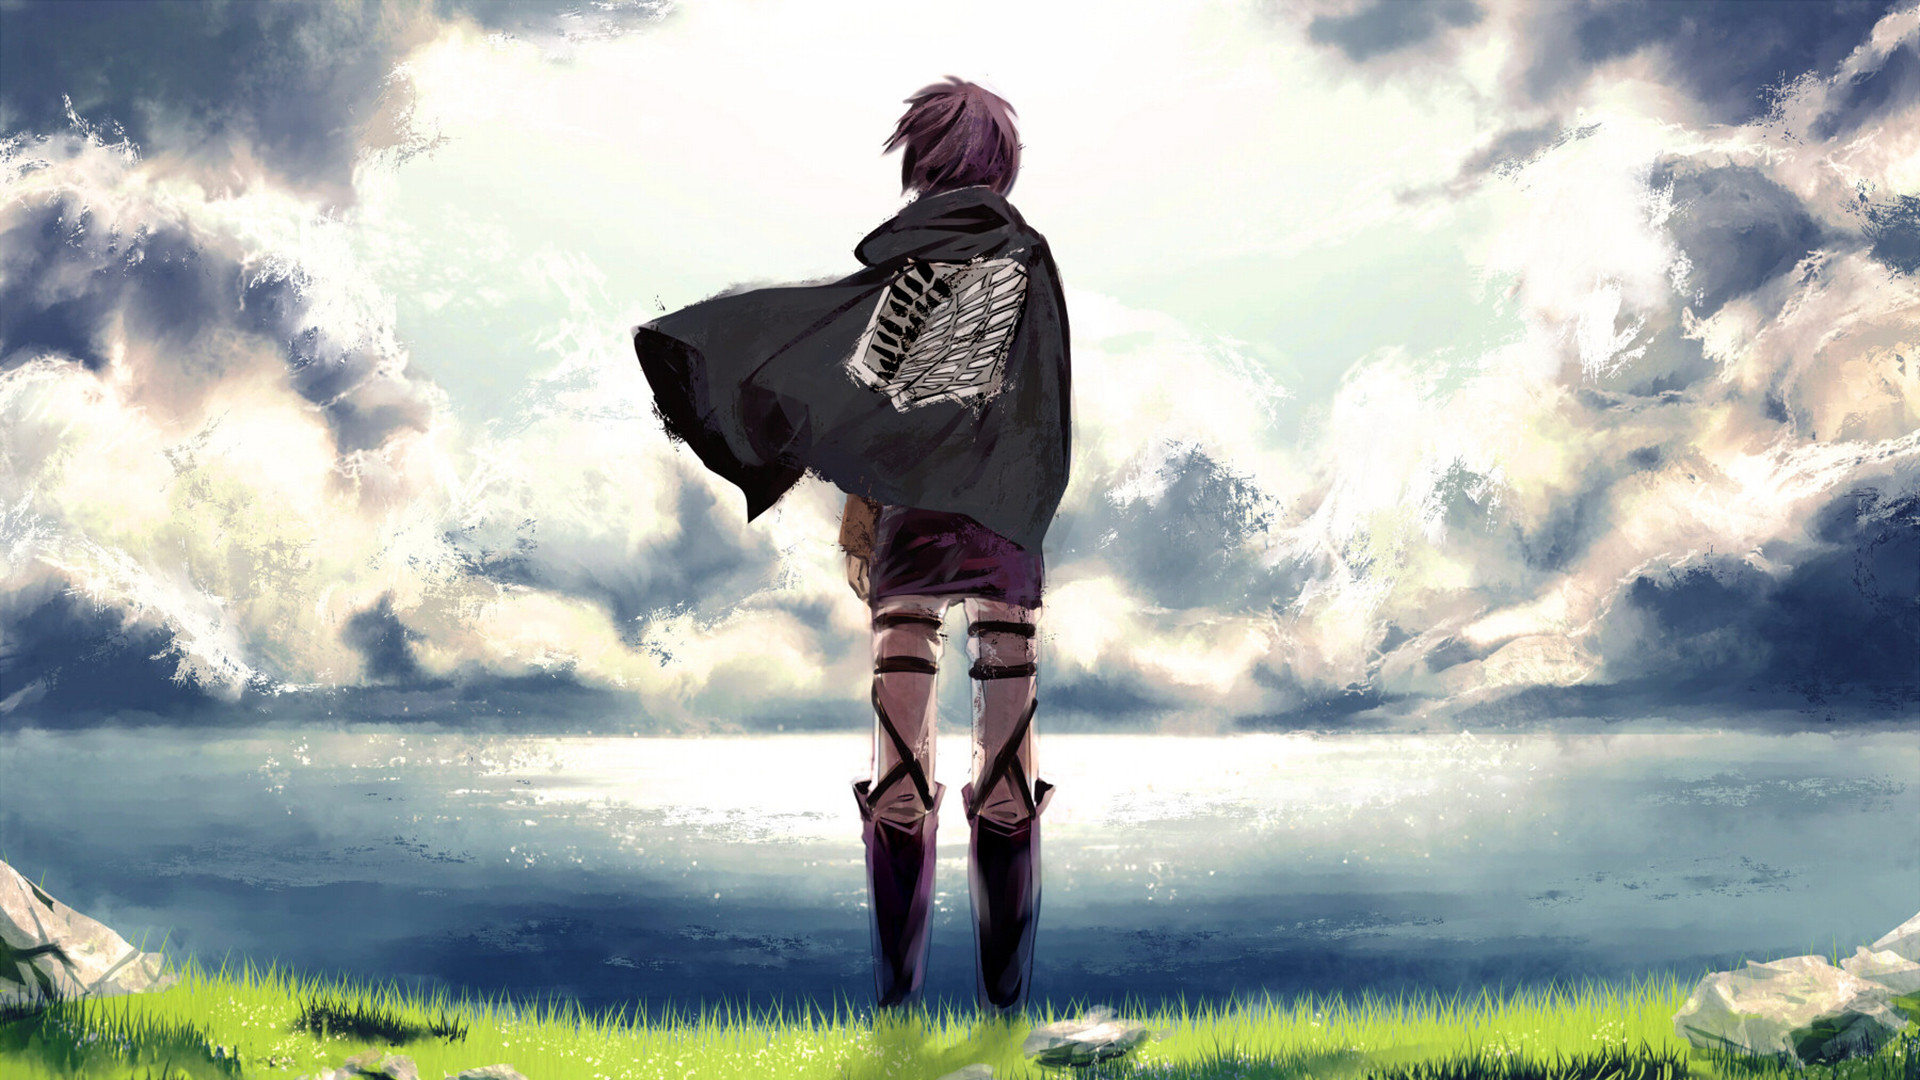 Anime – Attack On Titan Scouting Legion Shingeki No Kyojin Wallpaper